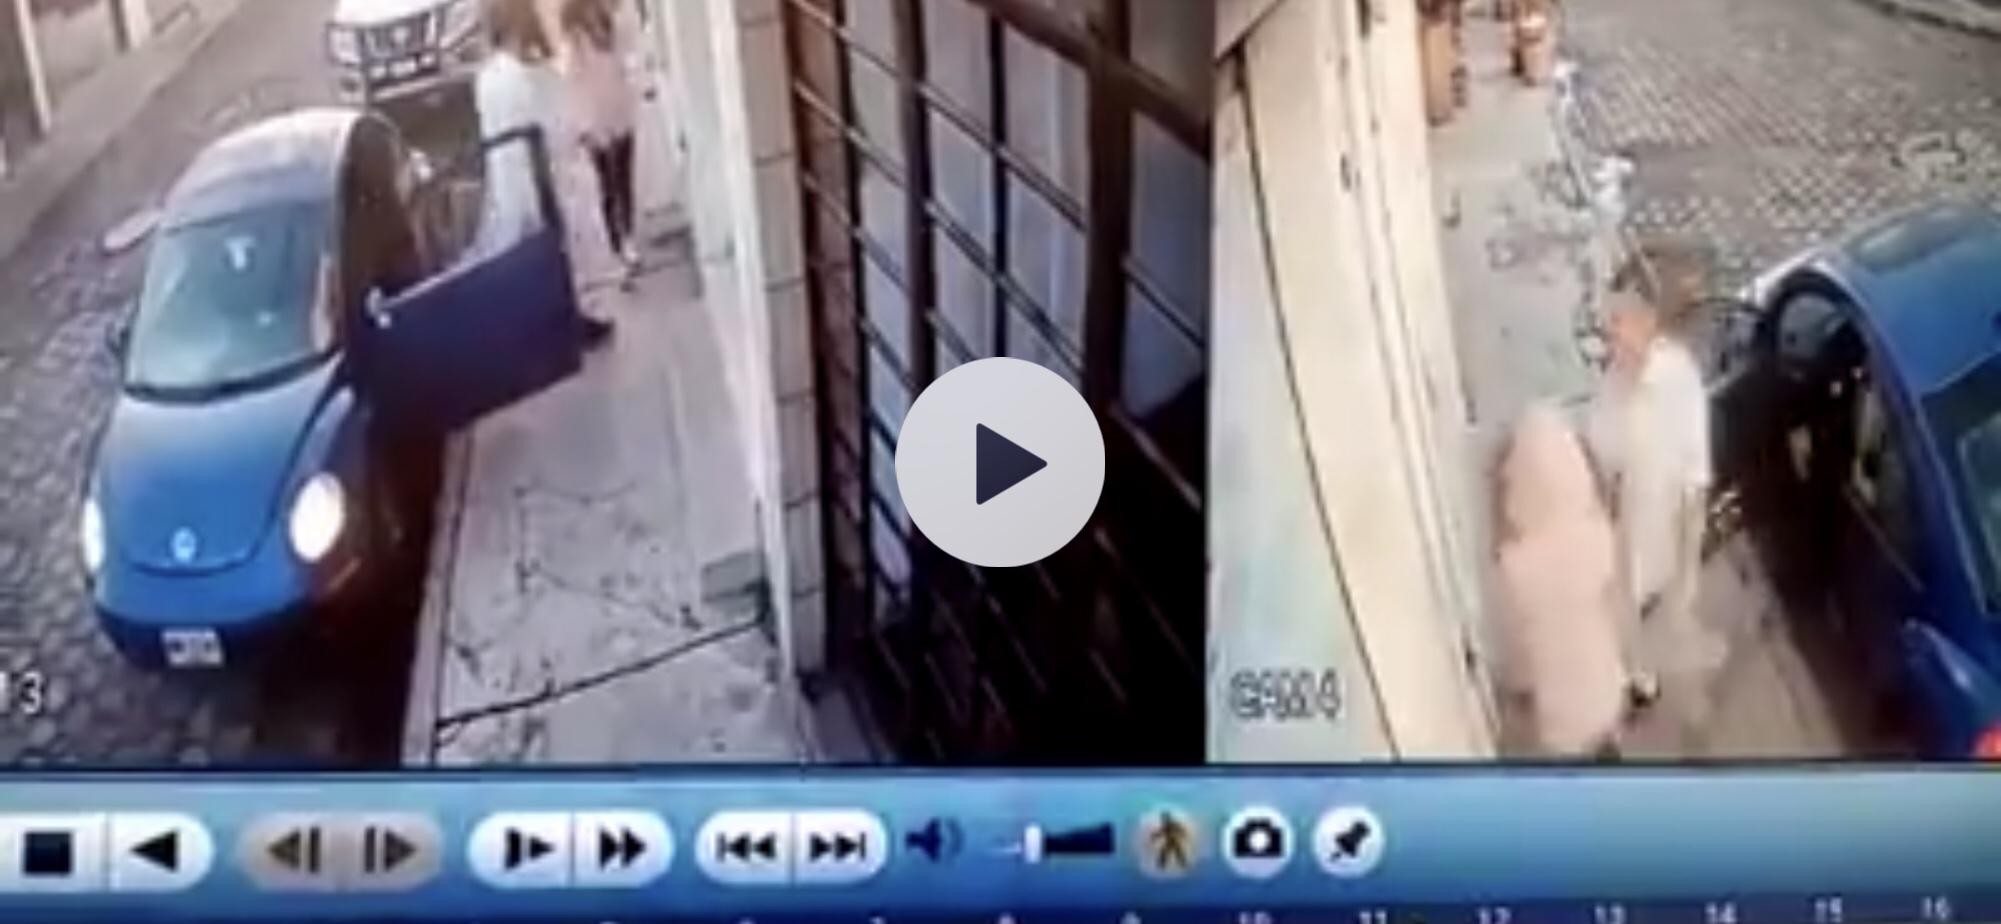 #Video Mujer se salva de ser raptada en Metepec